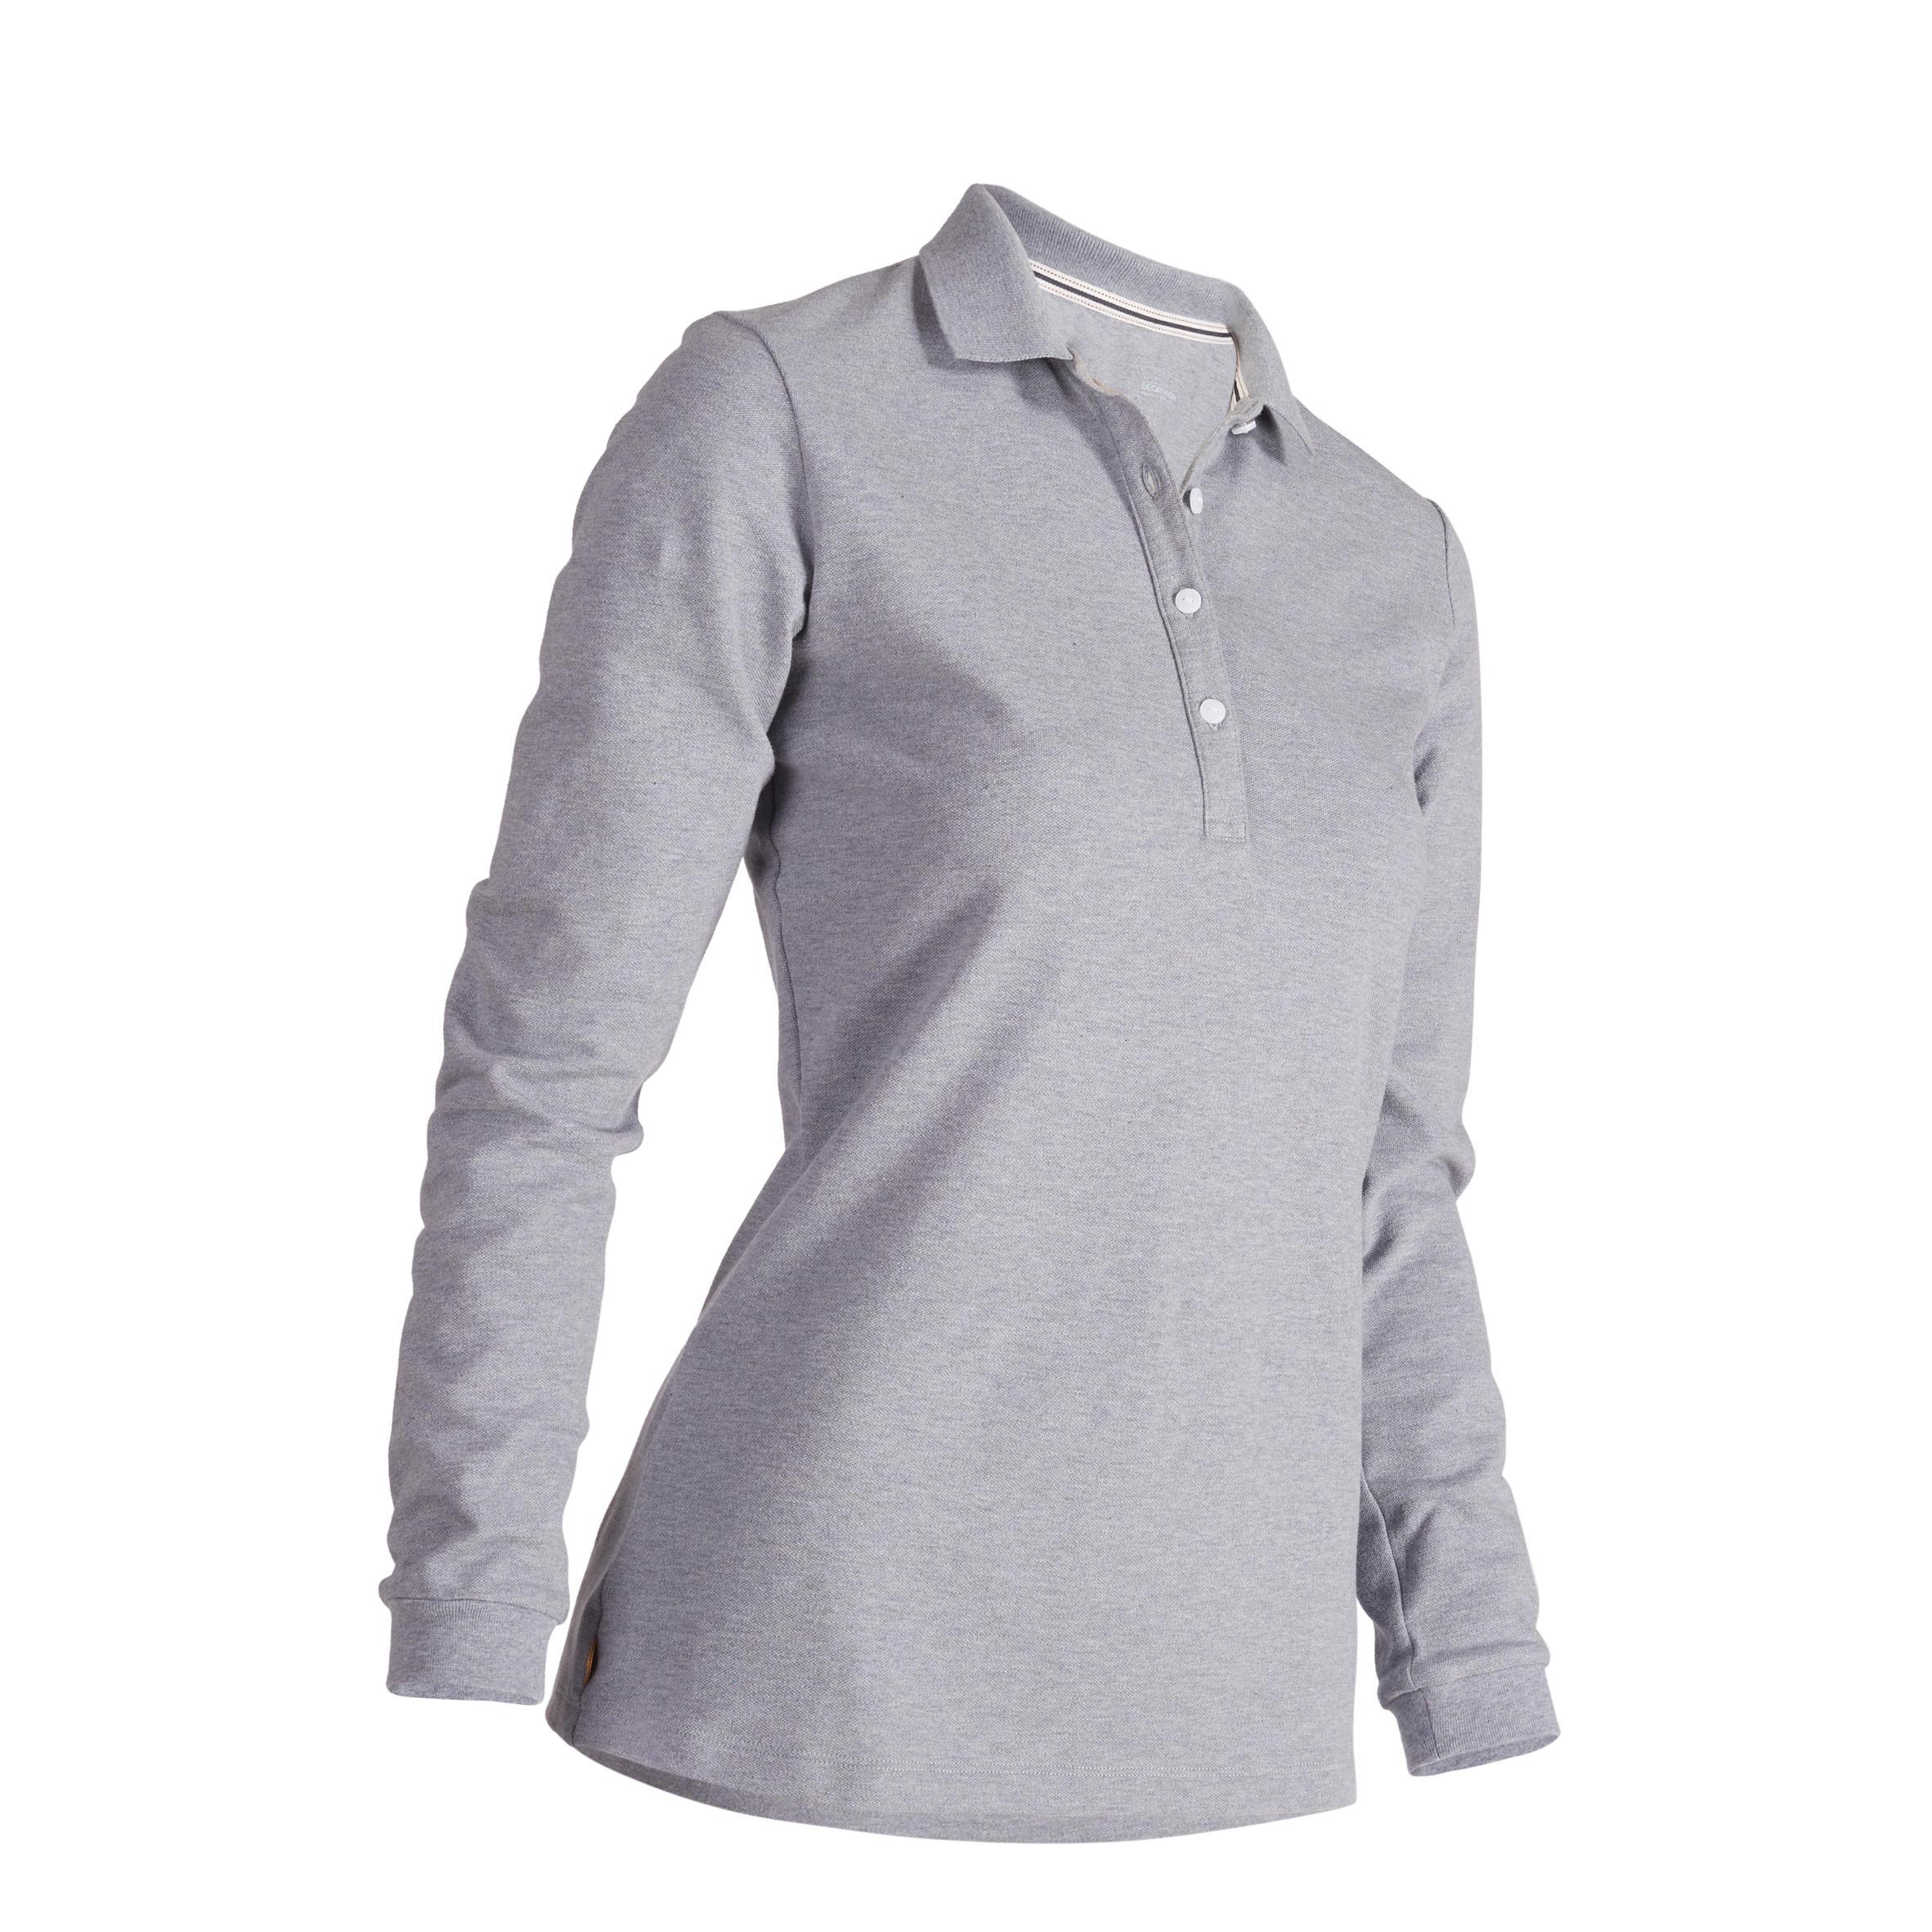 500 Women's Golf Long-Sleeved Polo - Heather Grey